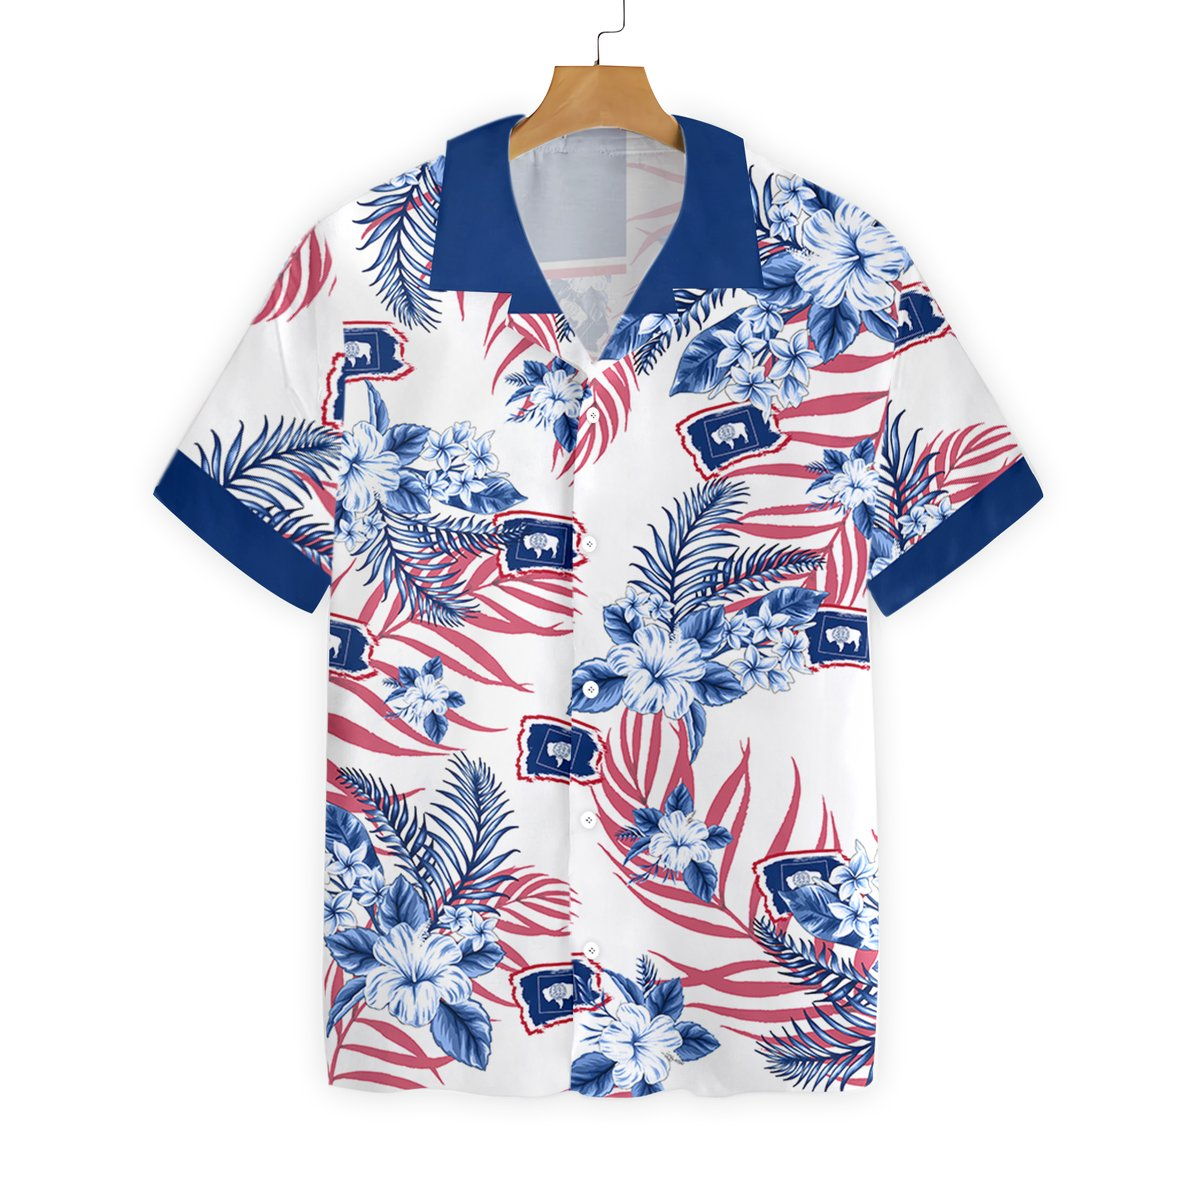 Wyoming Proud Hawaiian Shirt1 1